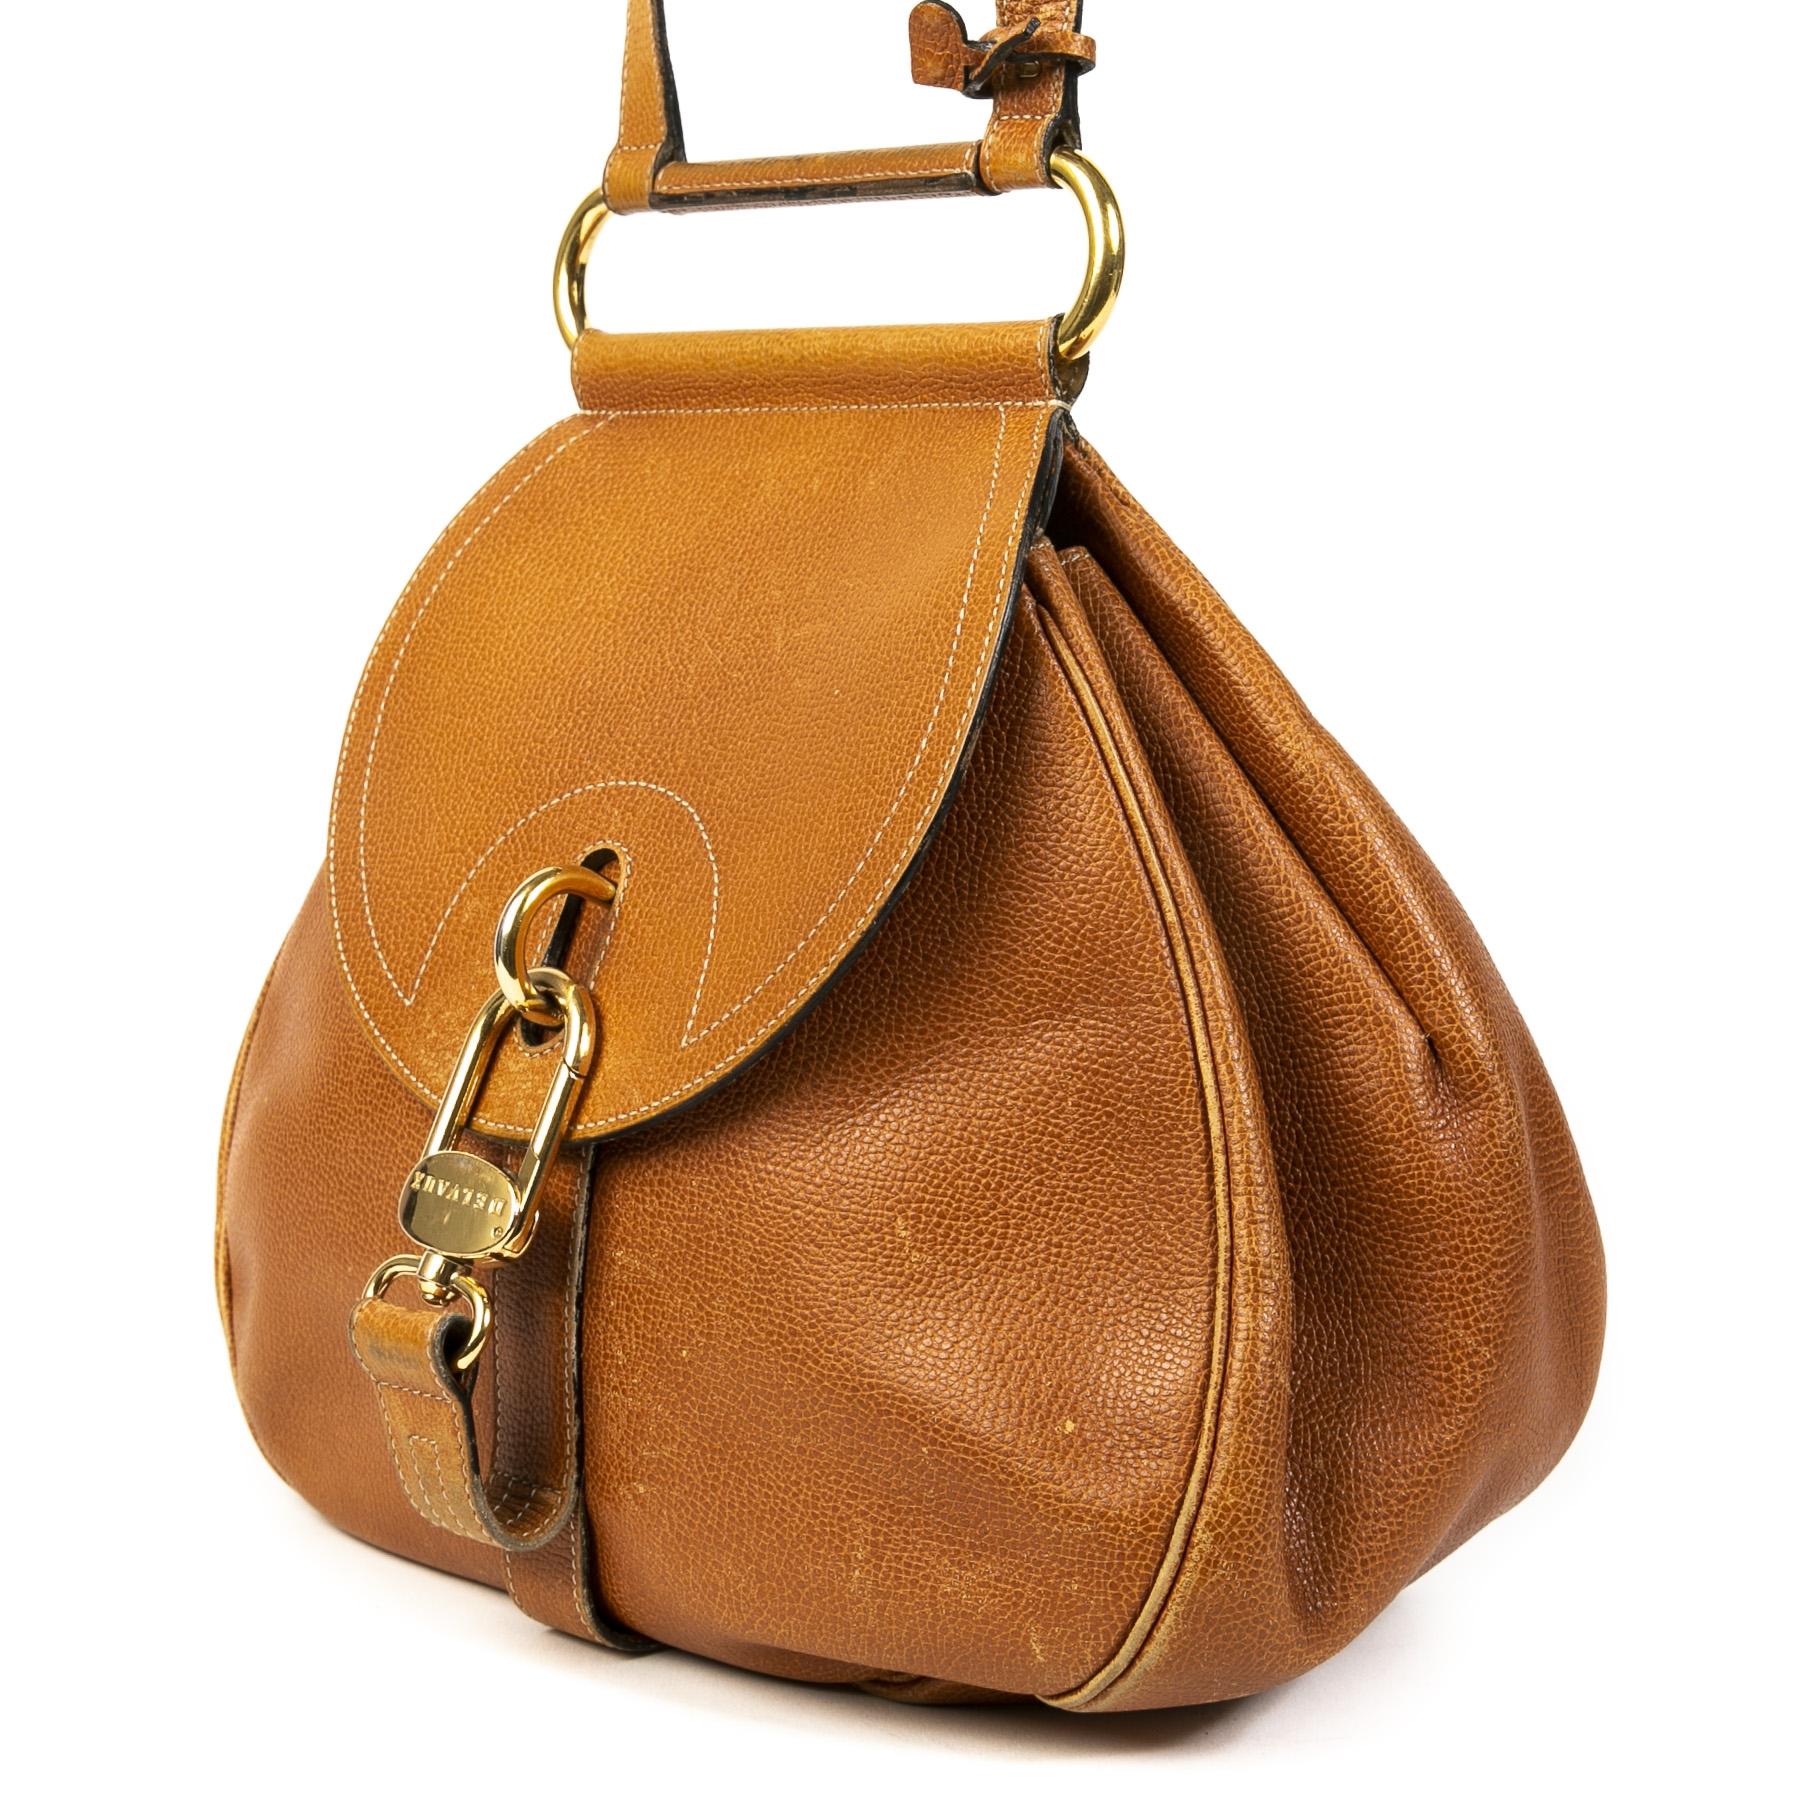 Authentic second-hand vintage Delvaux Camel Cerceau Crossbody Bag buy online webshop LabelLOV